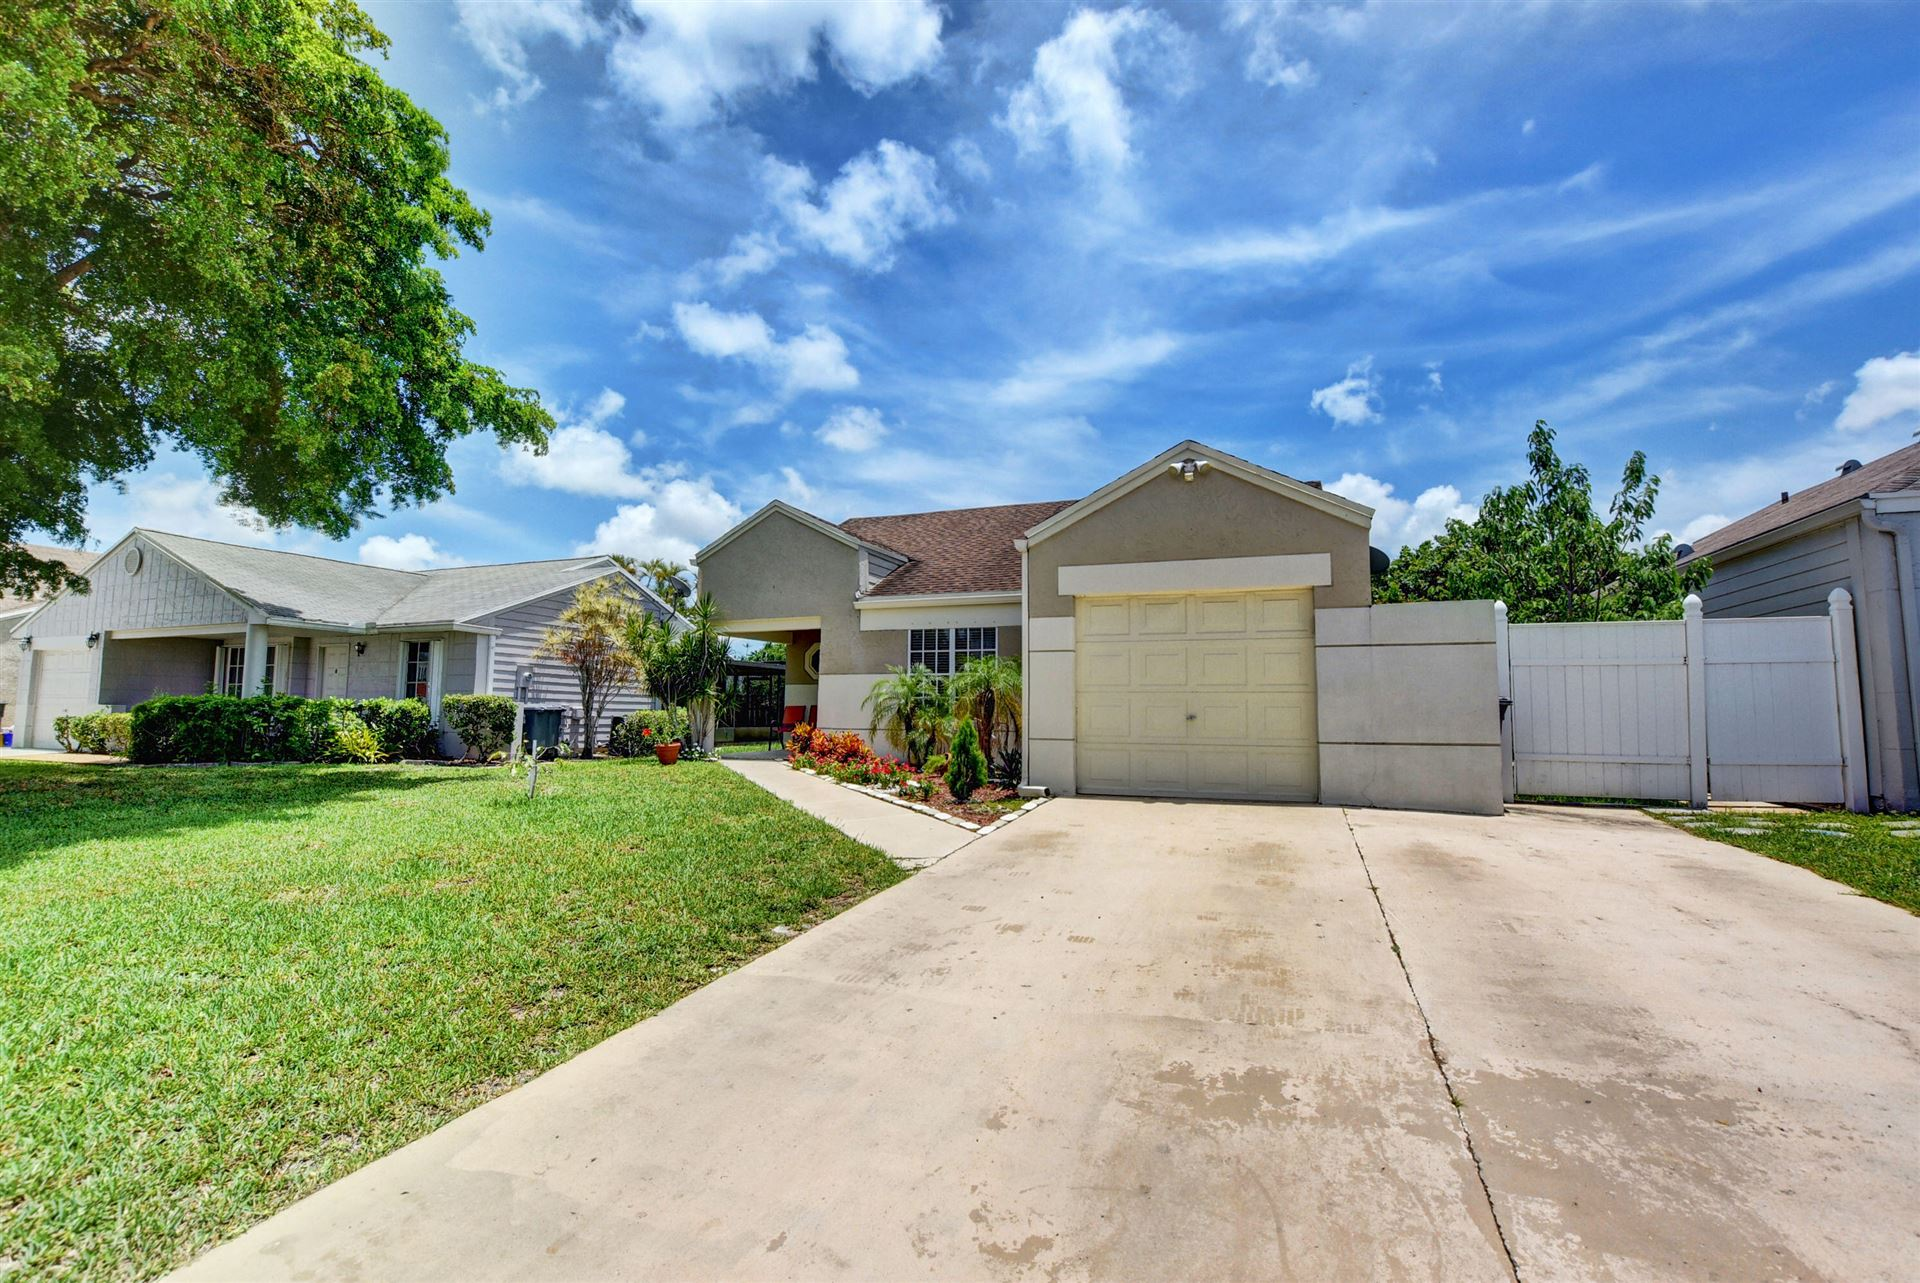 8478 Dynasty Drive, Boca Raton, FL 33433 - MLS#: RX-10722815